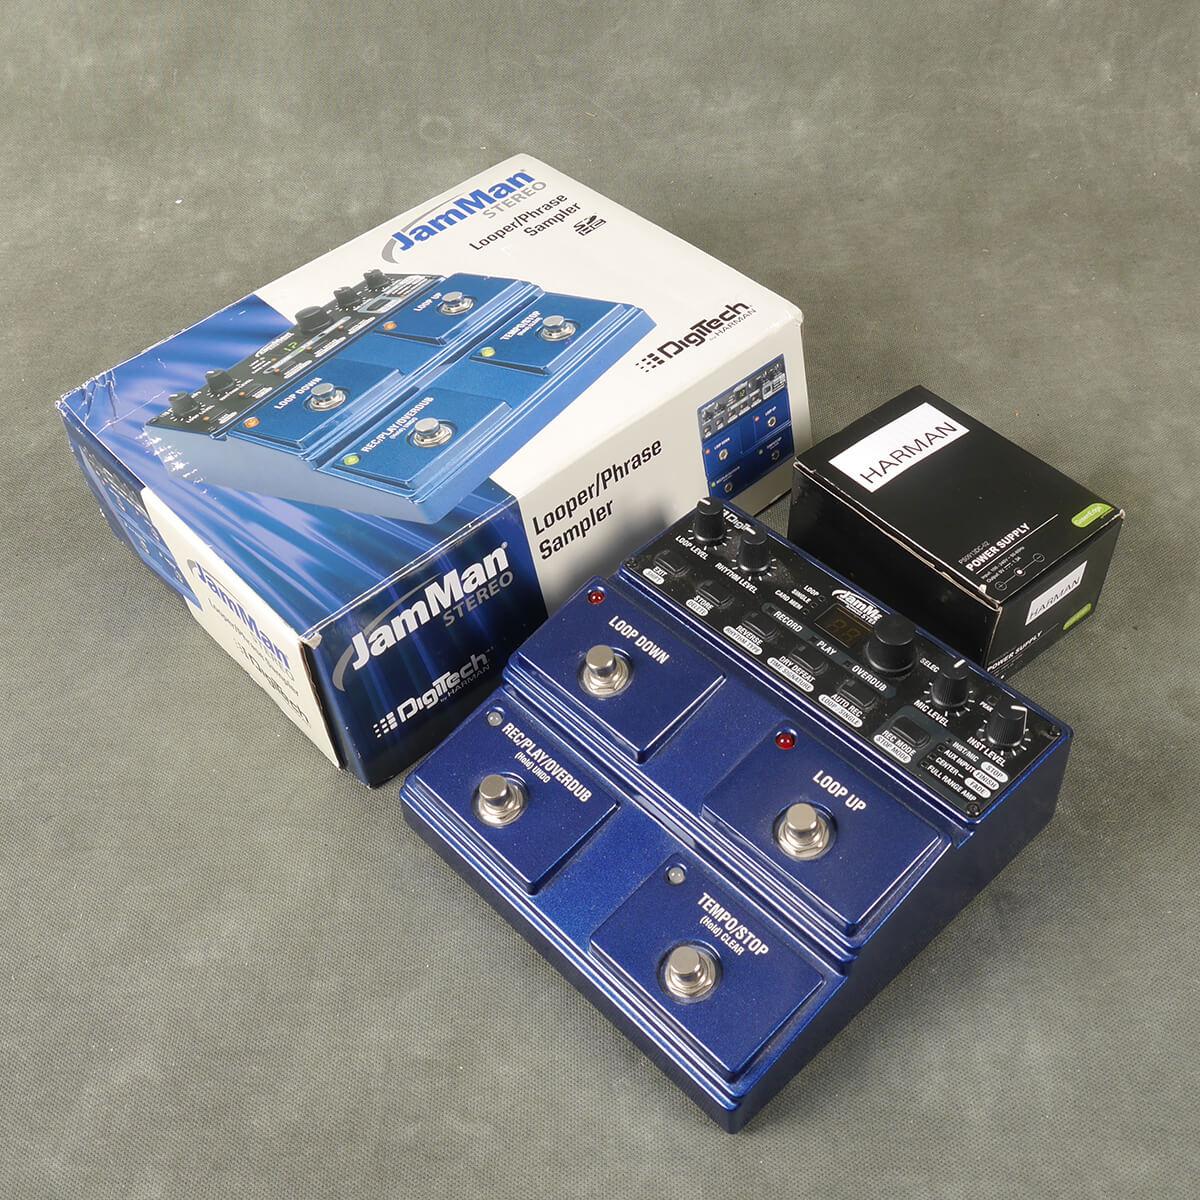 Digitech JamMan Stereo Looper FX Processor w/Box & PSU - 2nd Hand